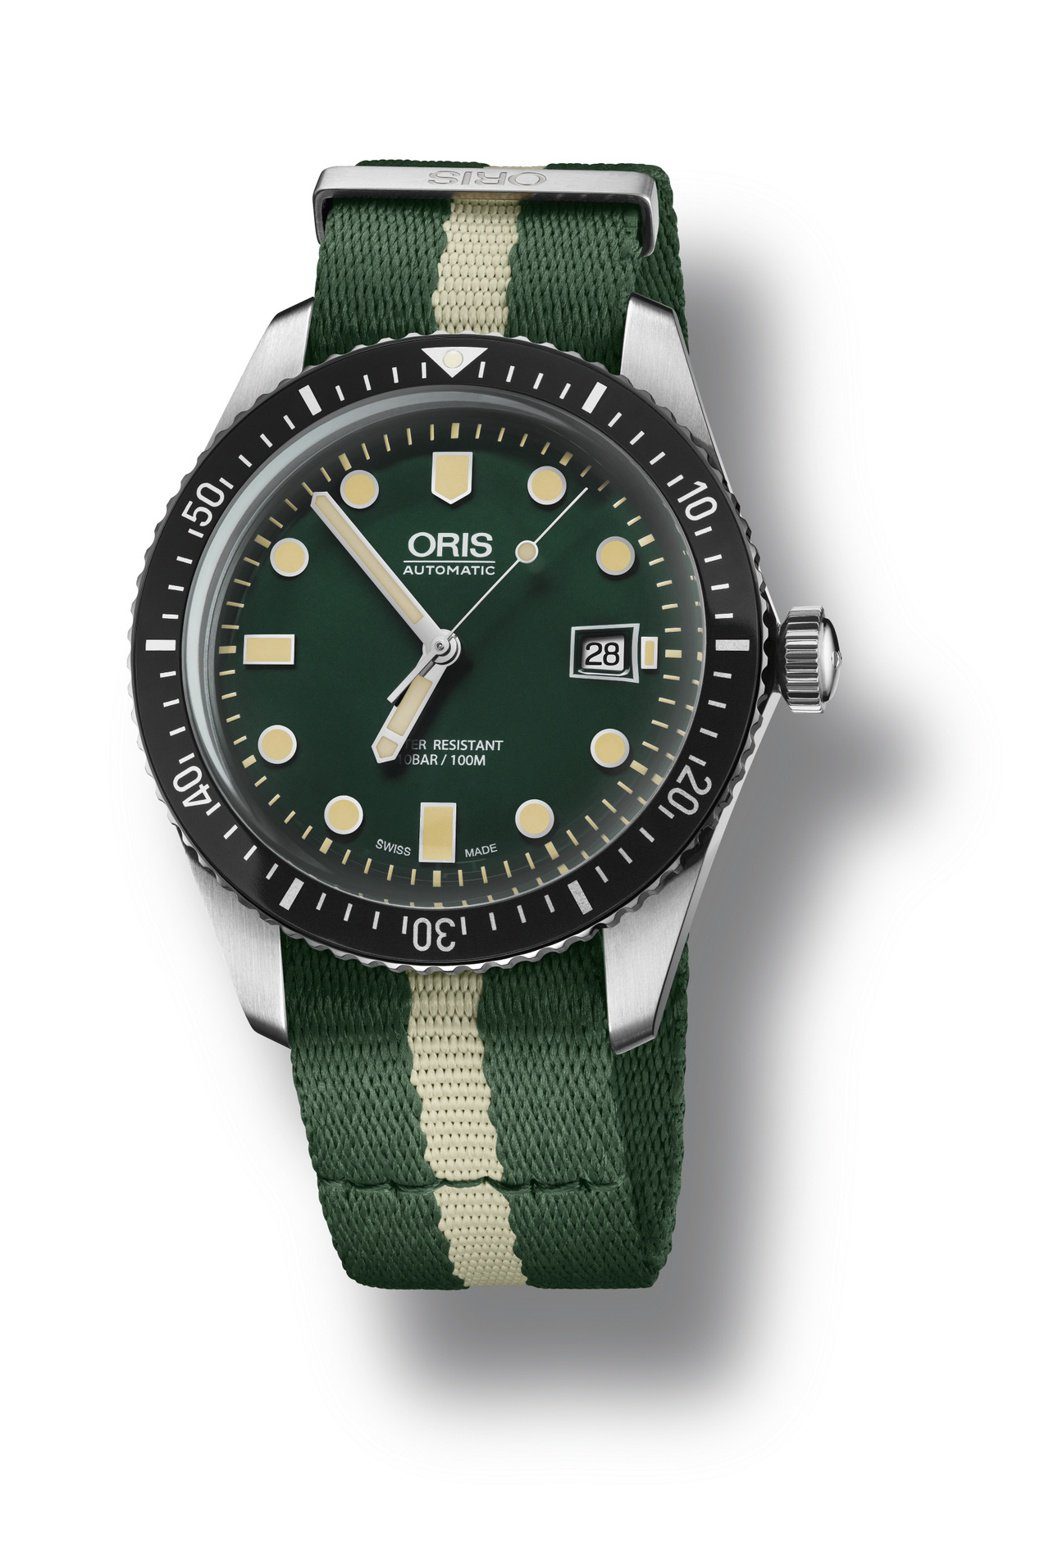 Oris Divers Sixty-Five潛水表綠色面盤搭配綠色Nato織帶,...